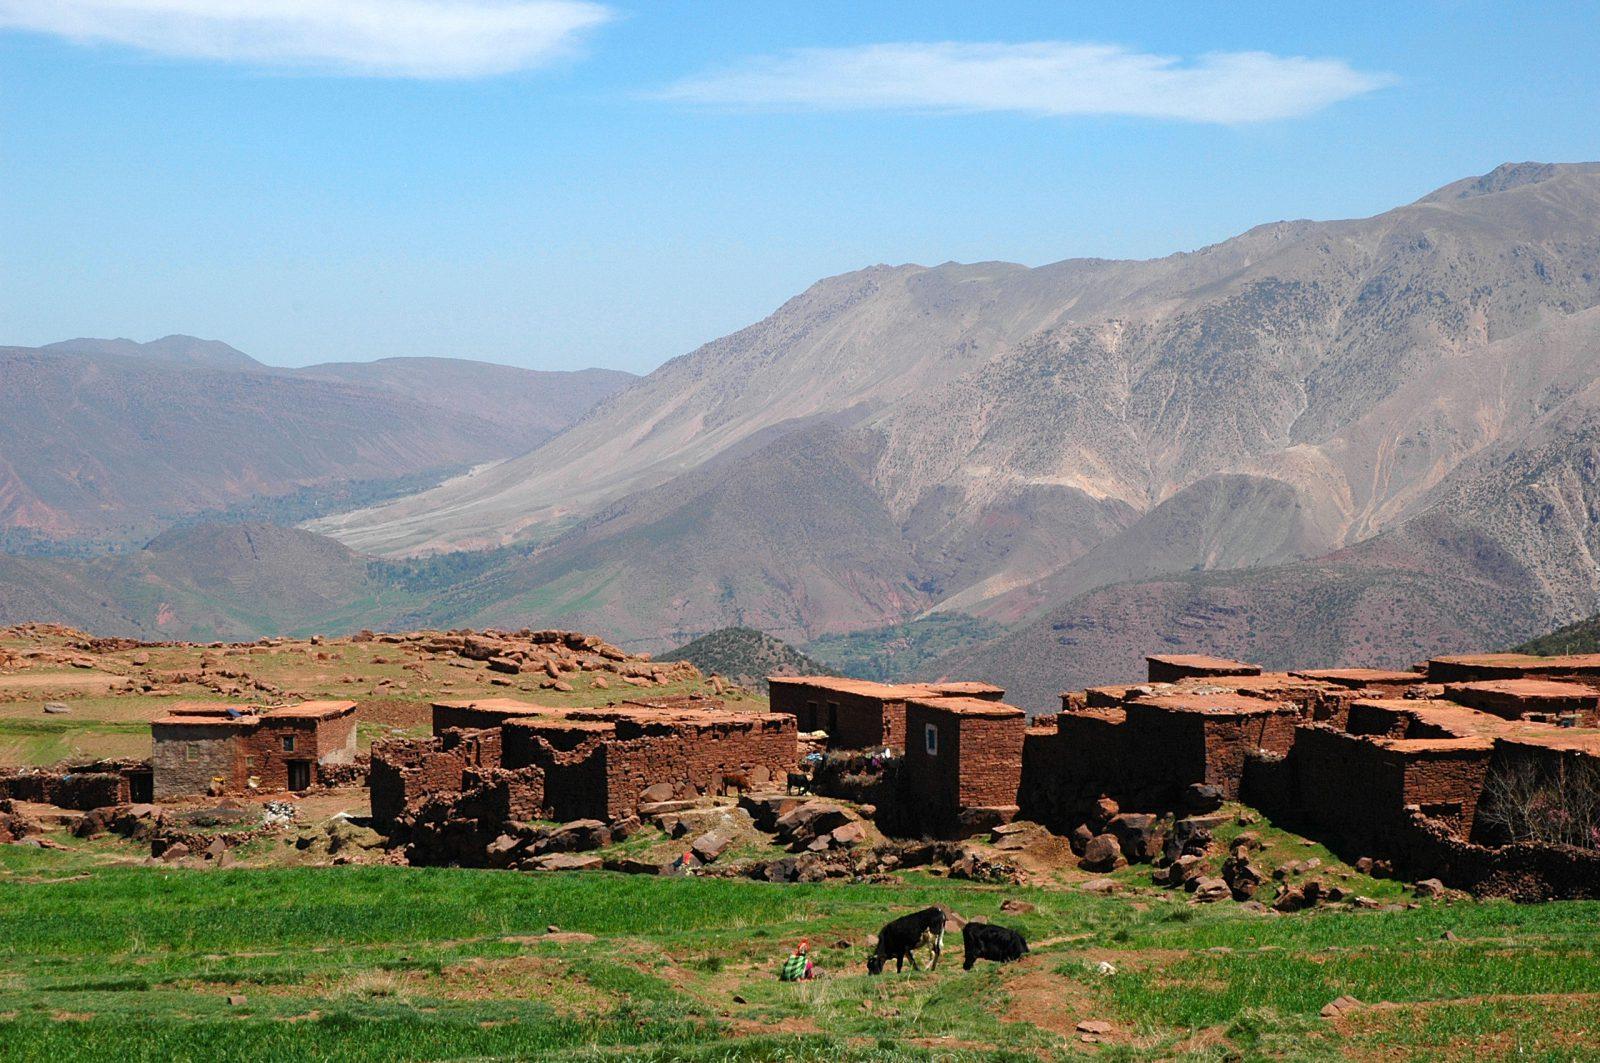 Dag 07 - Marokko Hoge Atlas wandelen 50+